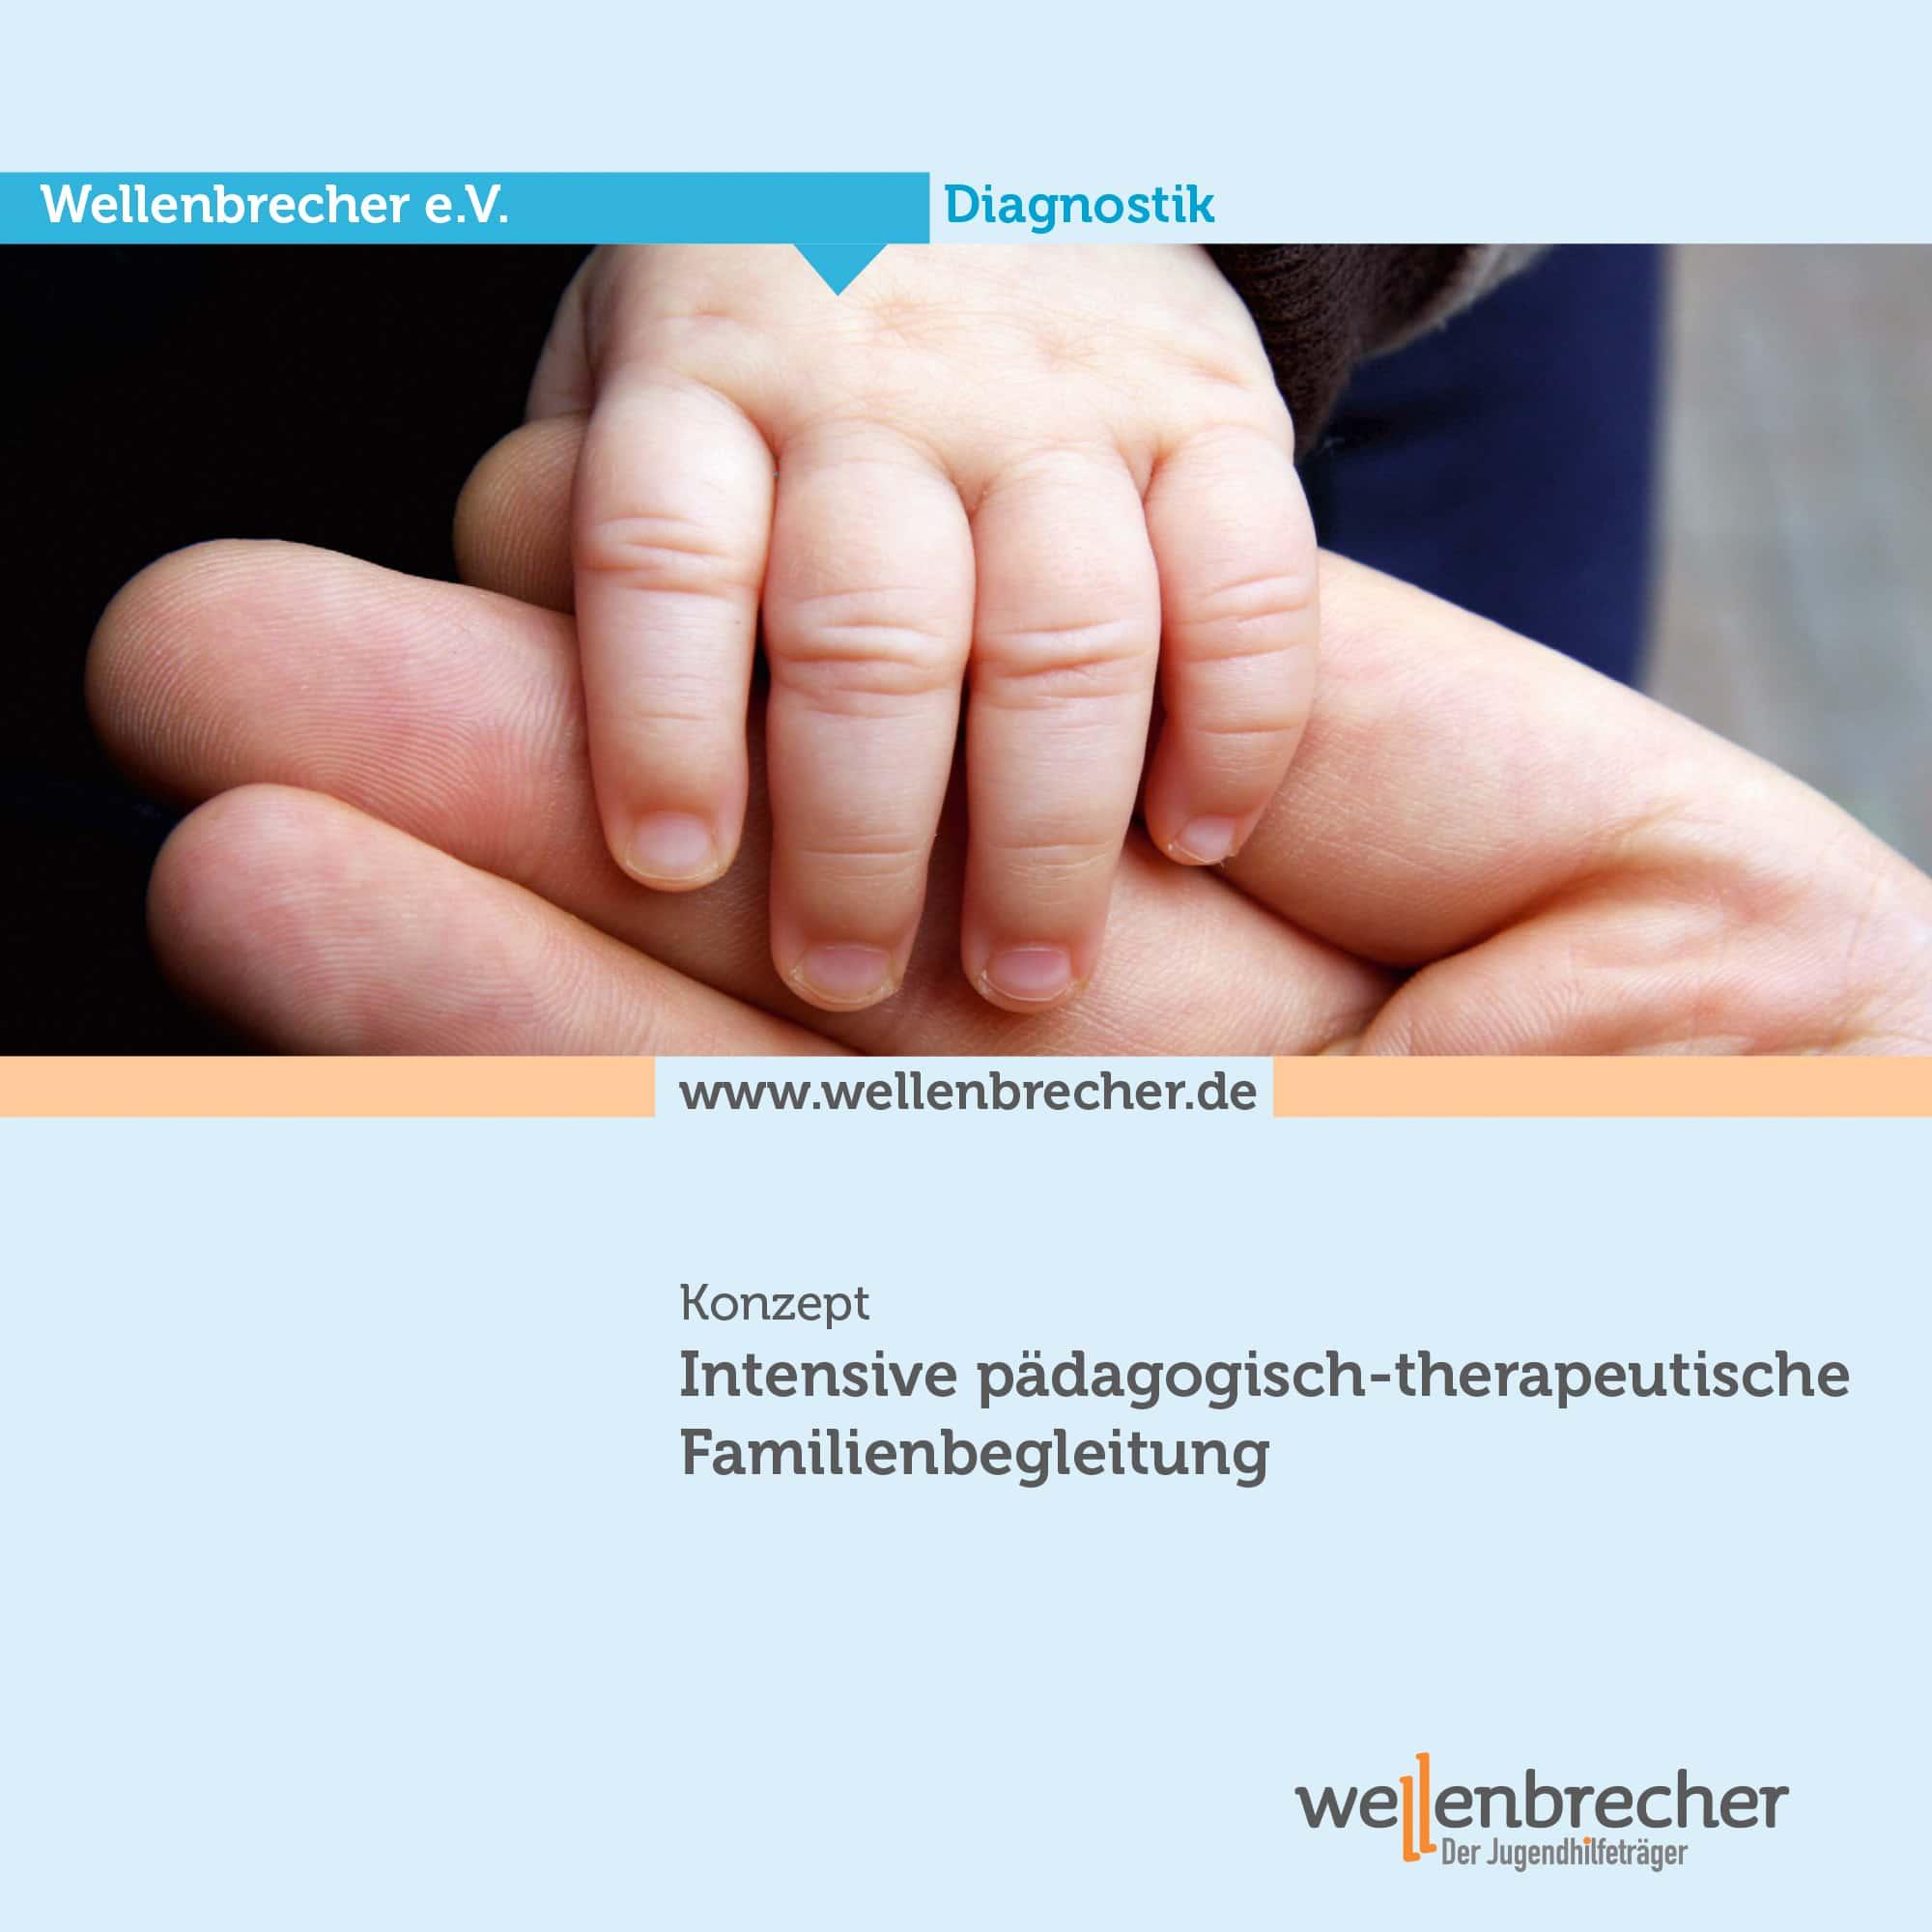 Download Konzeption Intensive pädagogisch-therapeutische Familienbegleitung